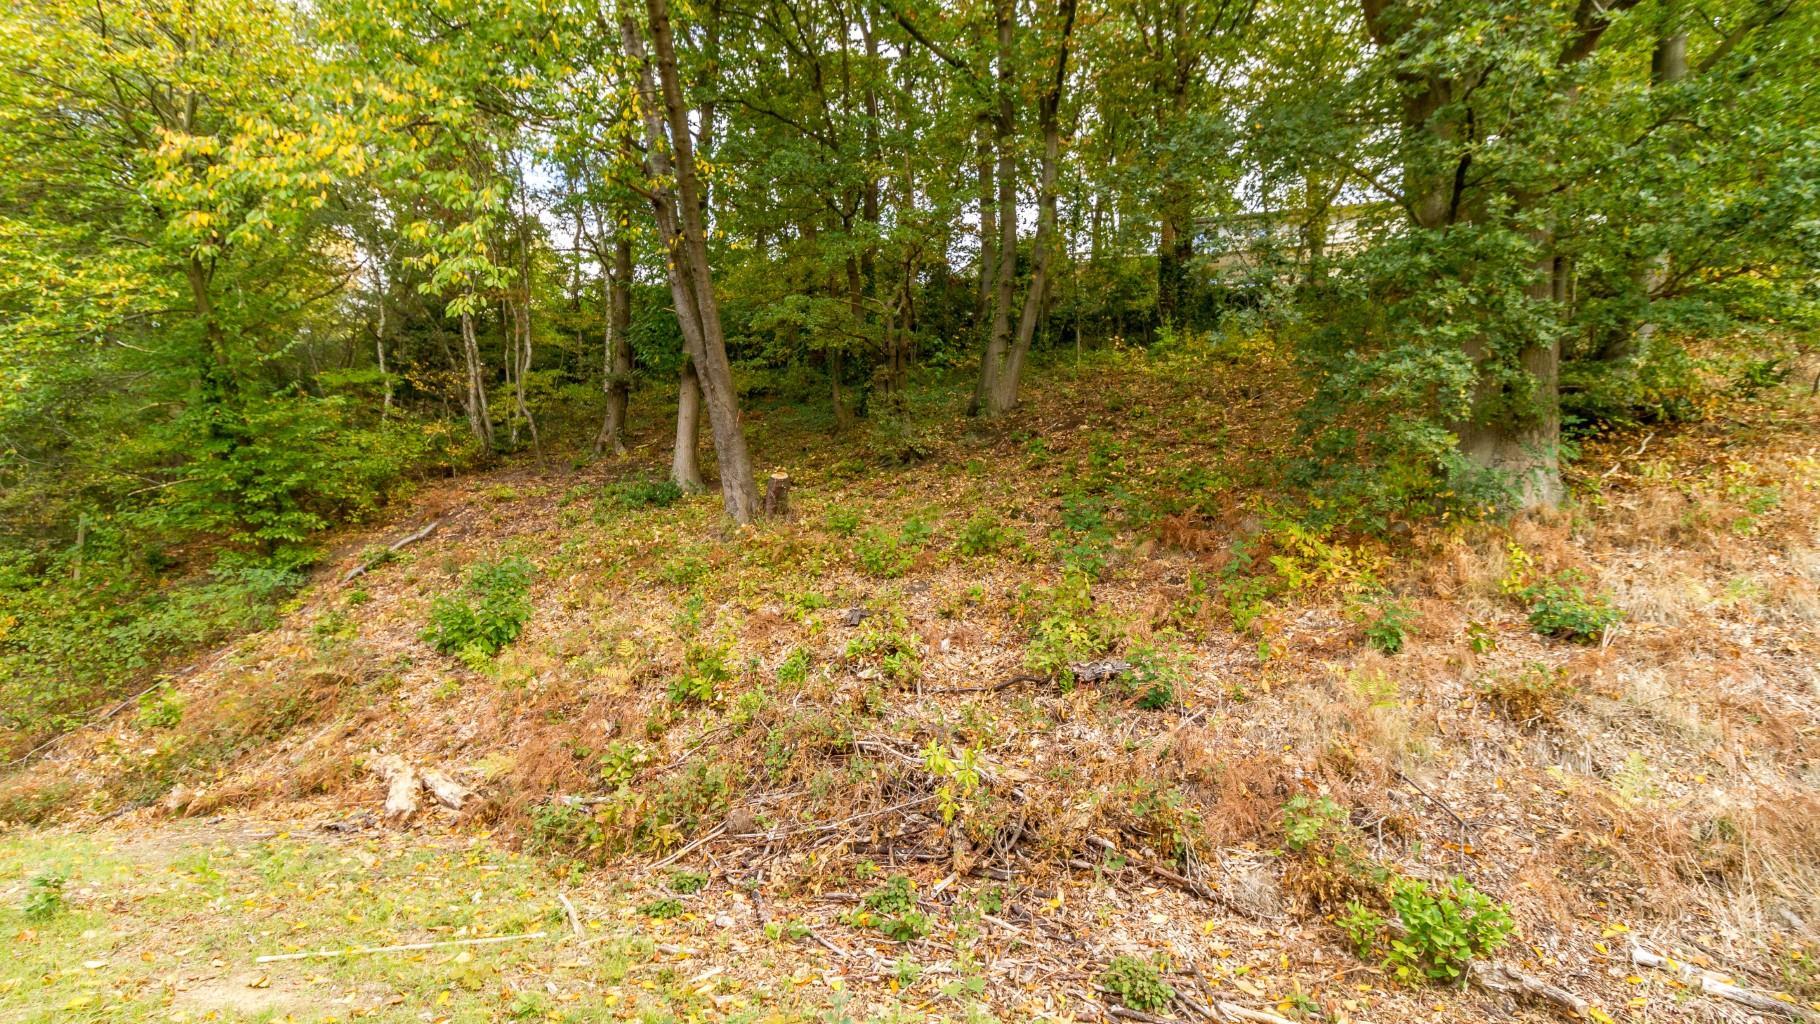 Terrain à bâtir - Ottignies-Louvain-la-Neuve - #3591481-2